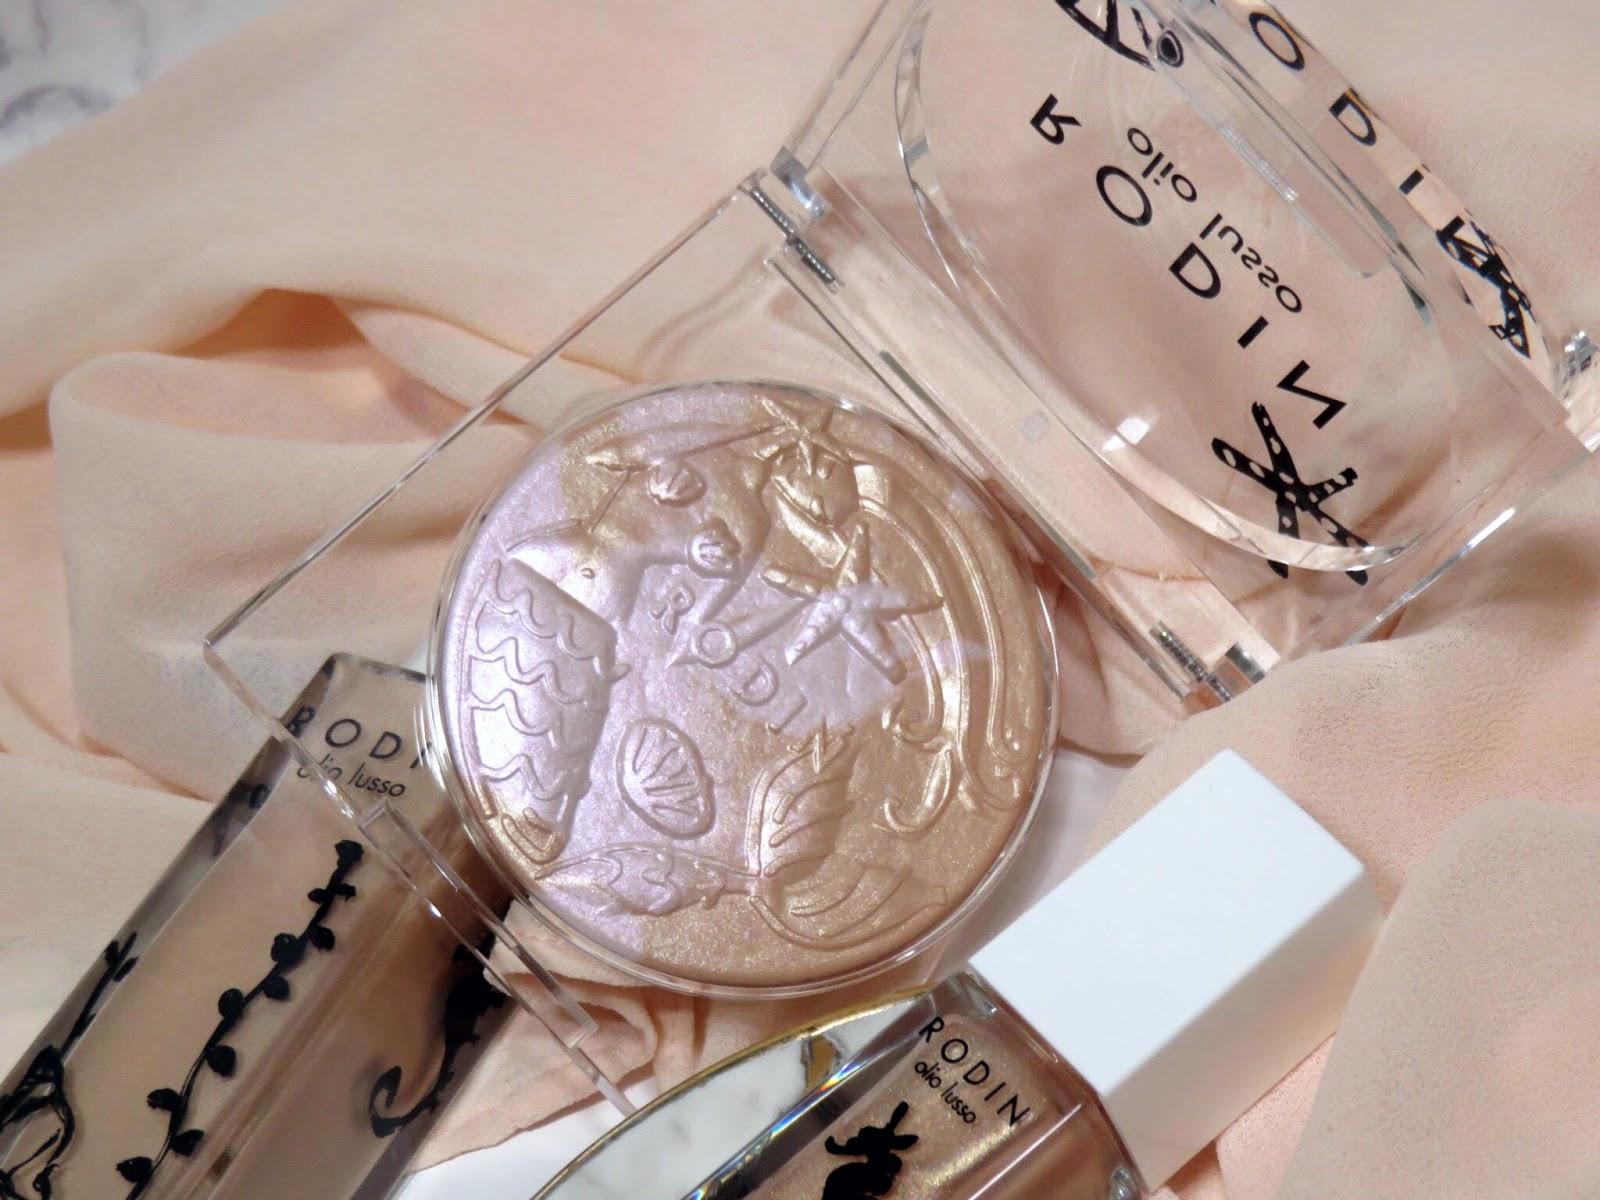 Review Rodin Olio Lusso Illuminating Powder Pretty Is My Profession Bobbi Brown Cheek Palette Limited Edition